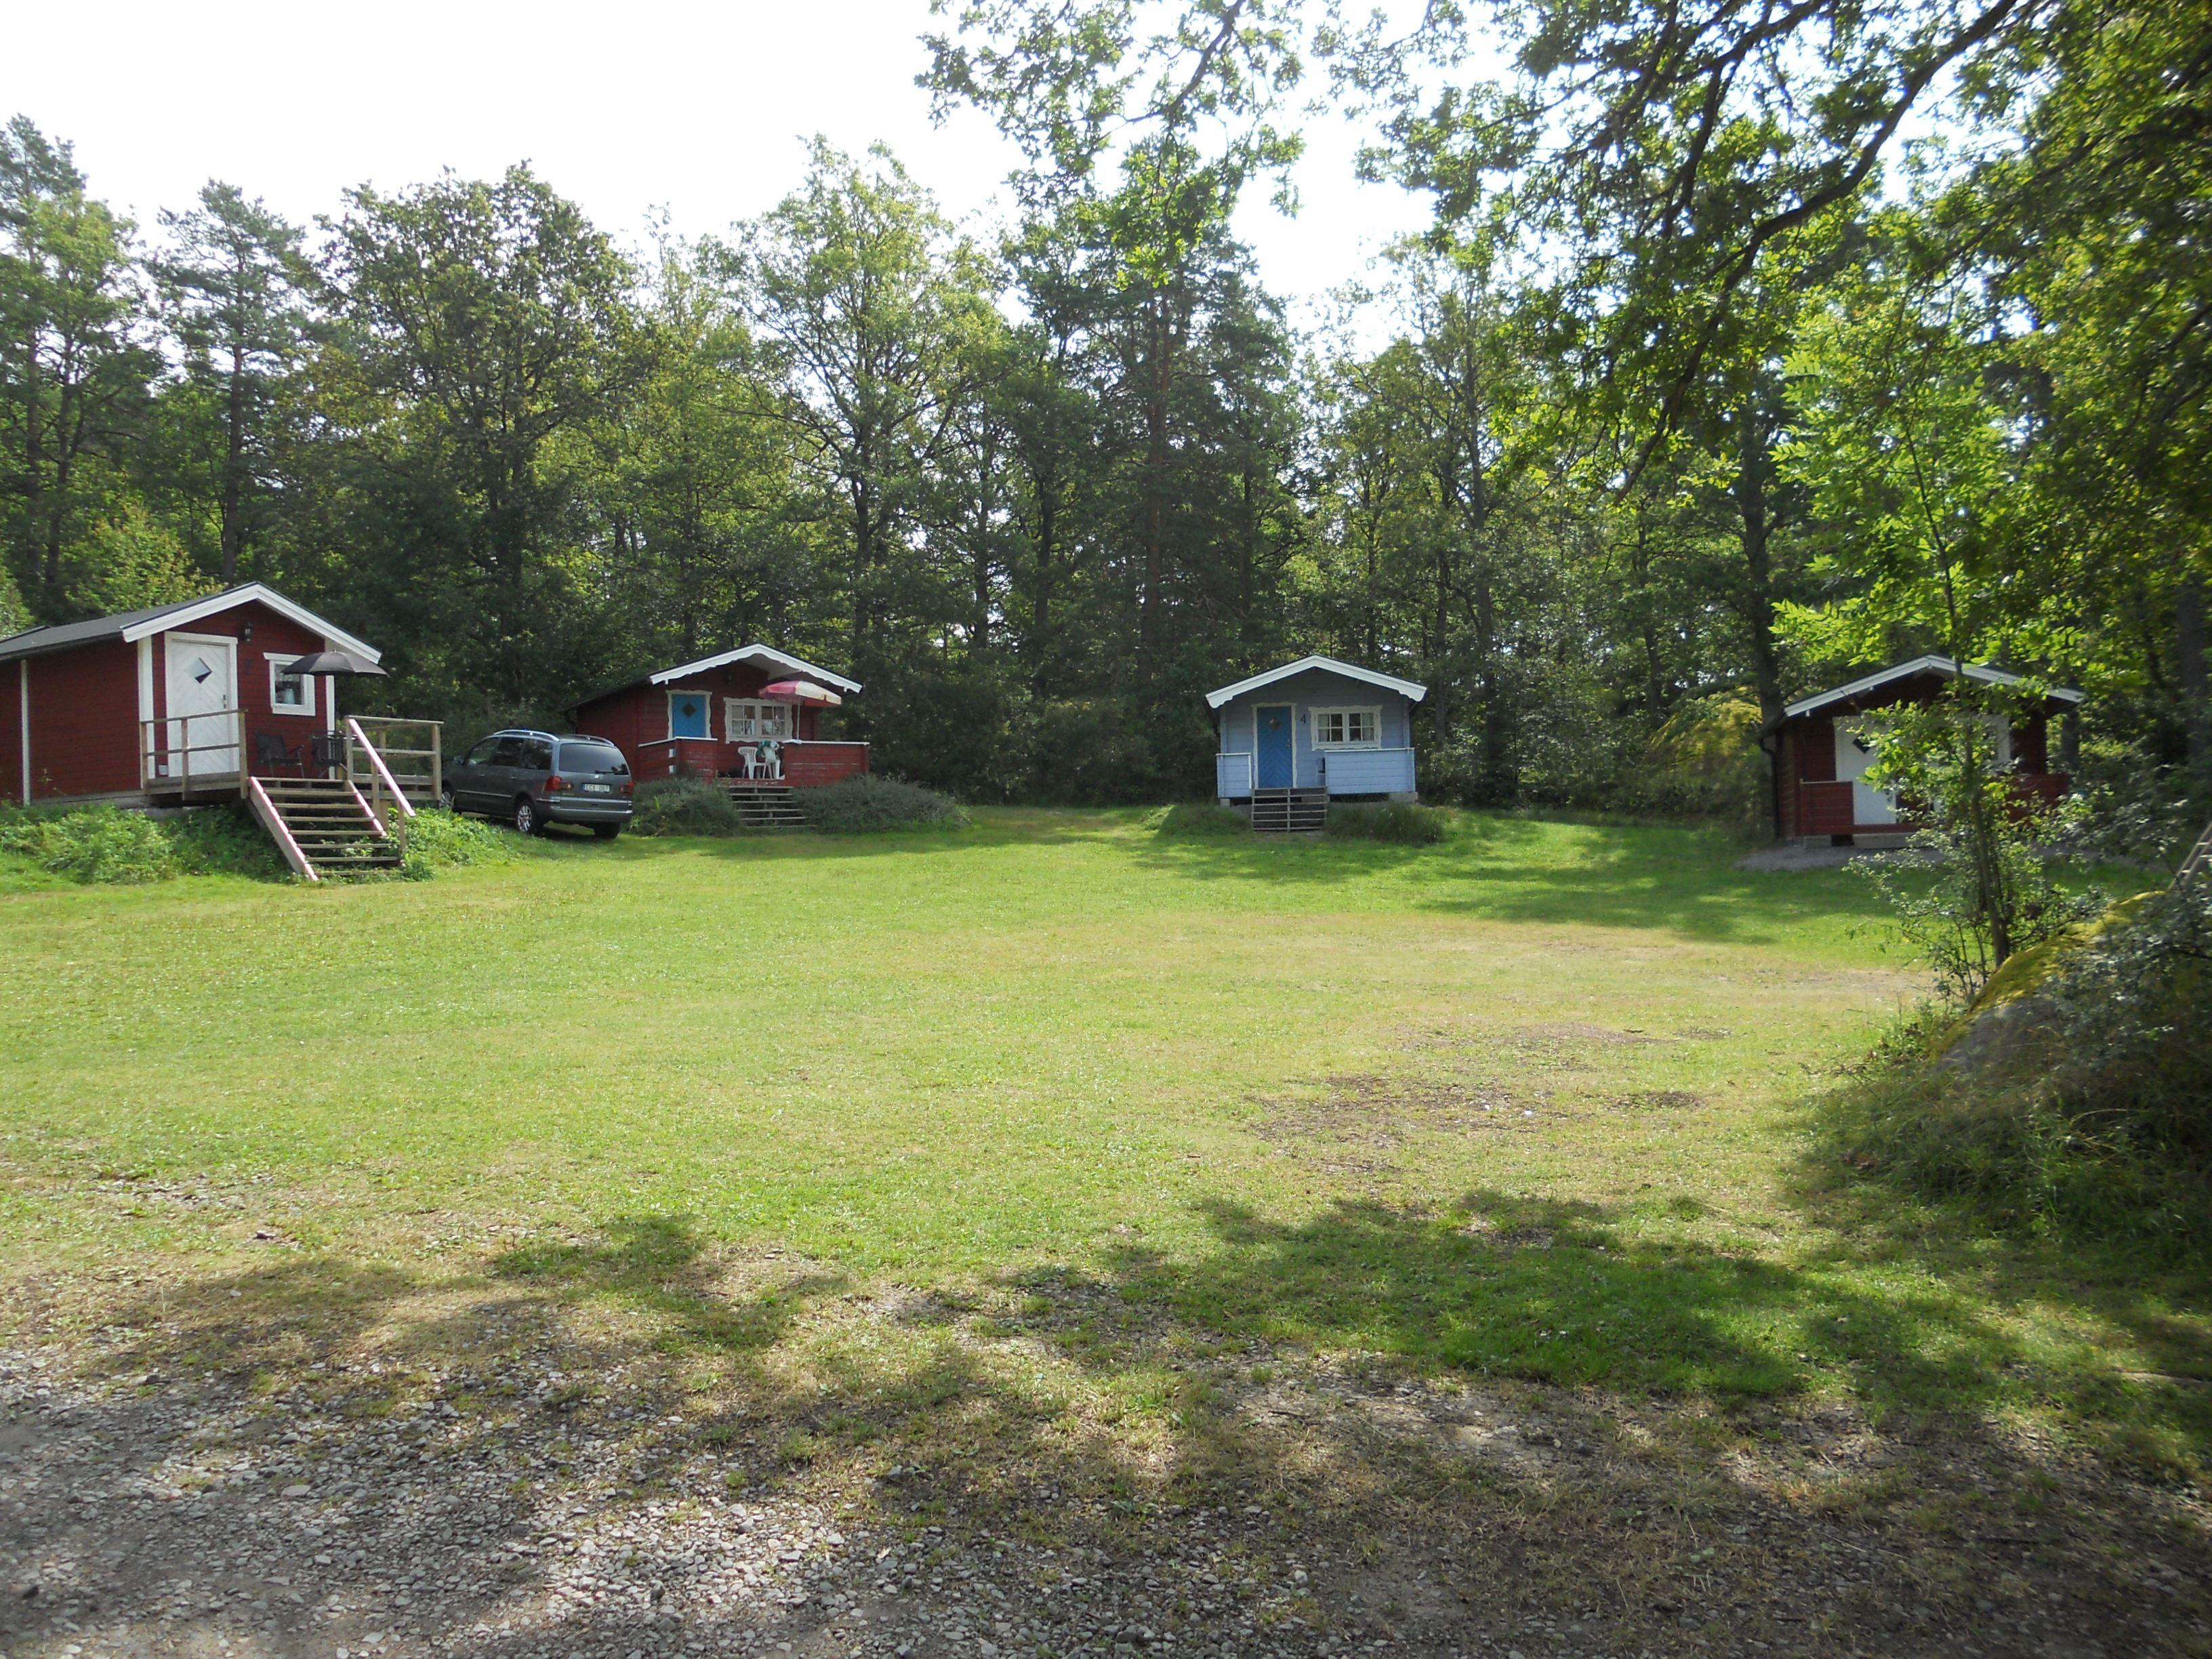 Blankaholms Naturcamping/Stugor